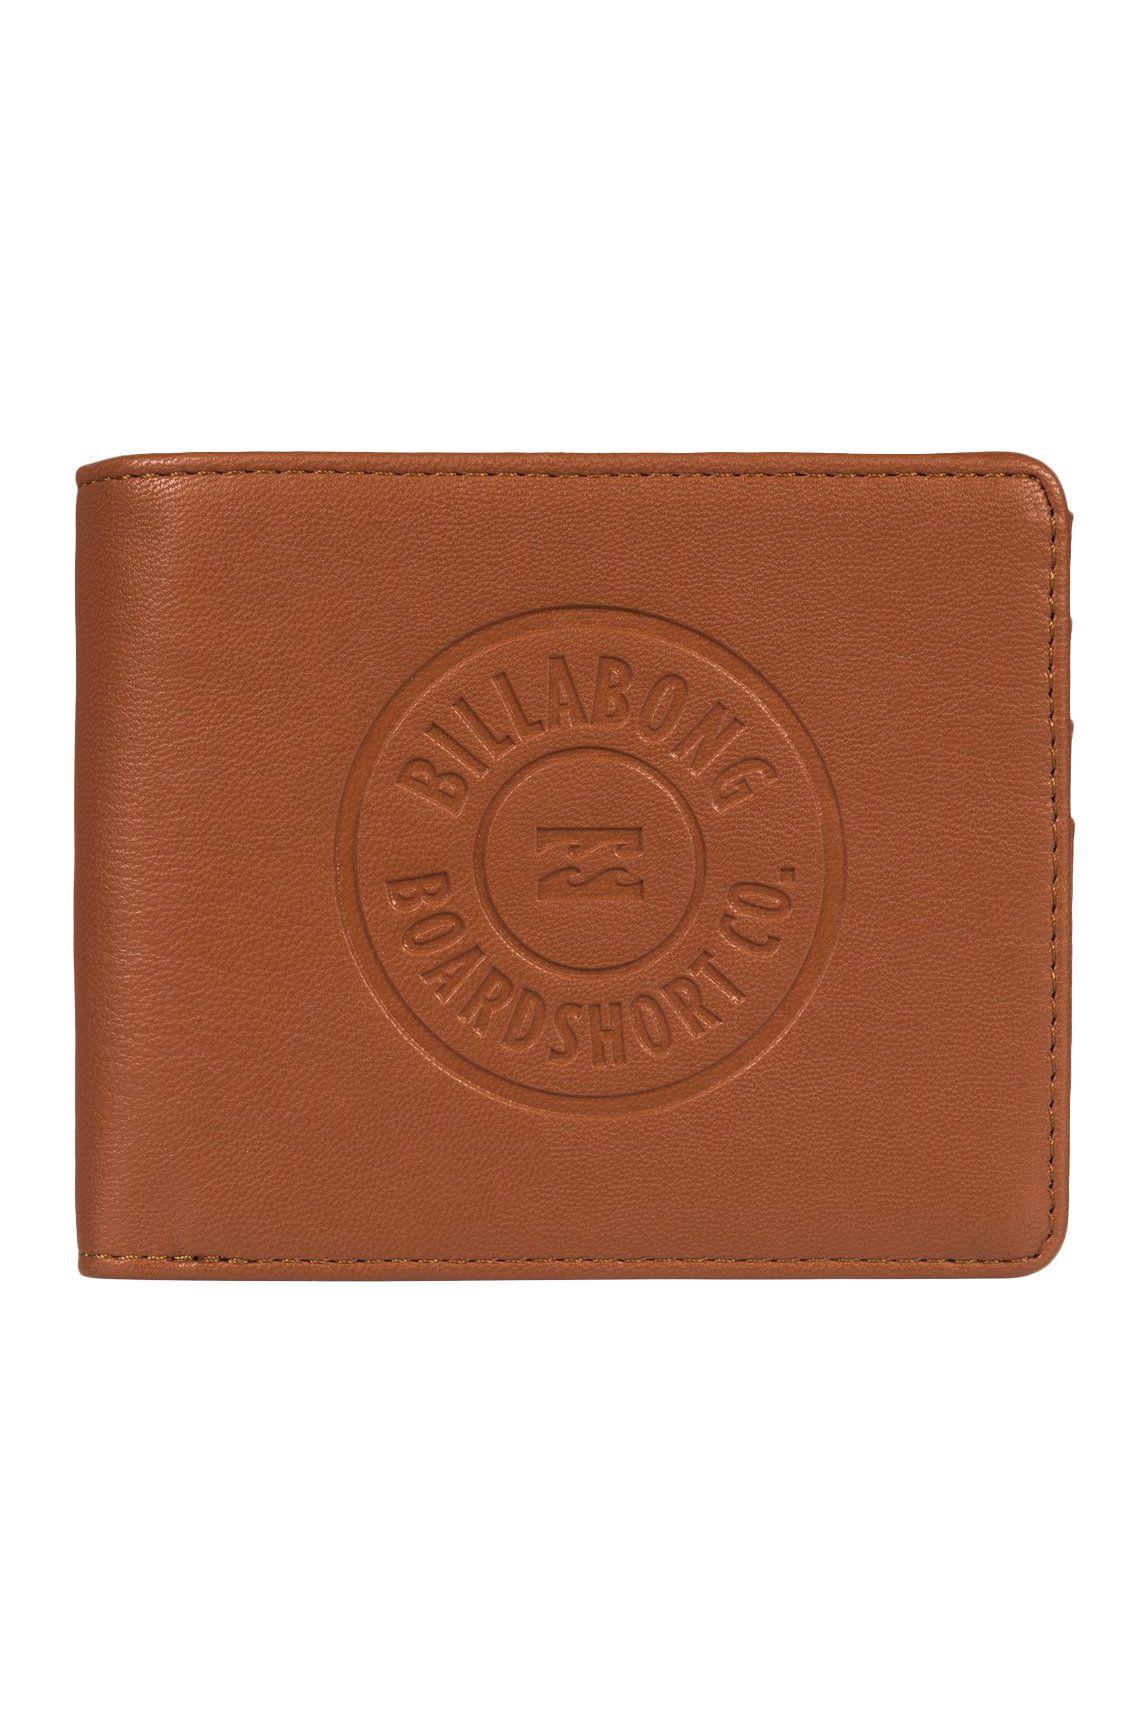 Billabong Wallet WALLED ID Tan